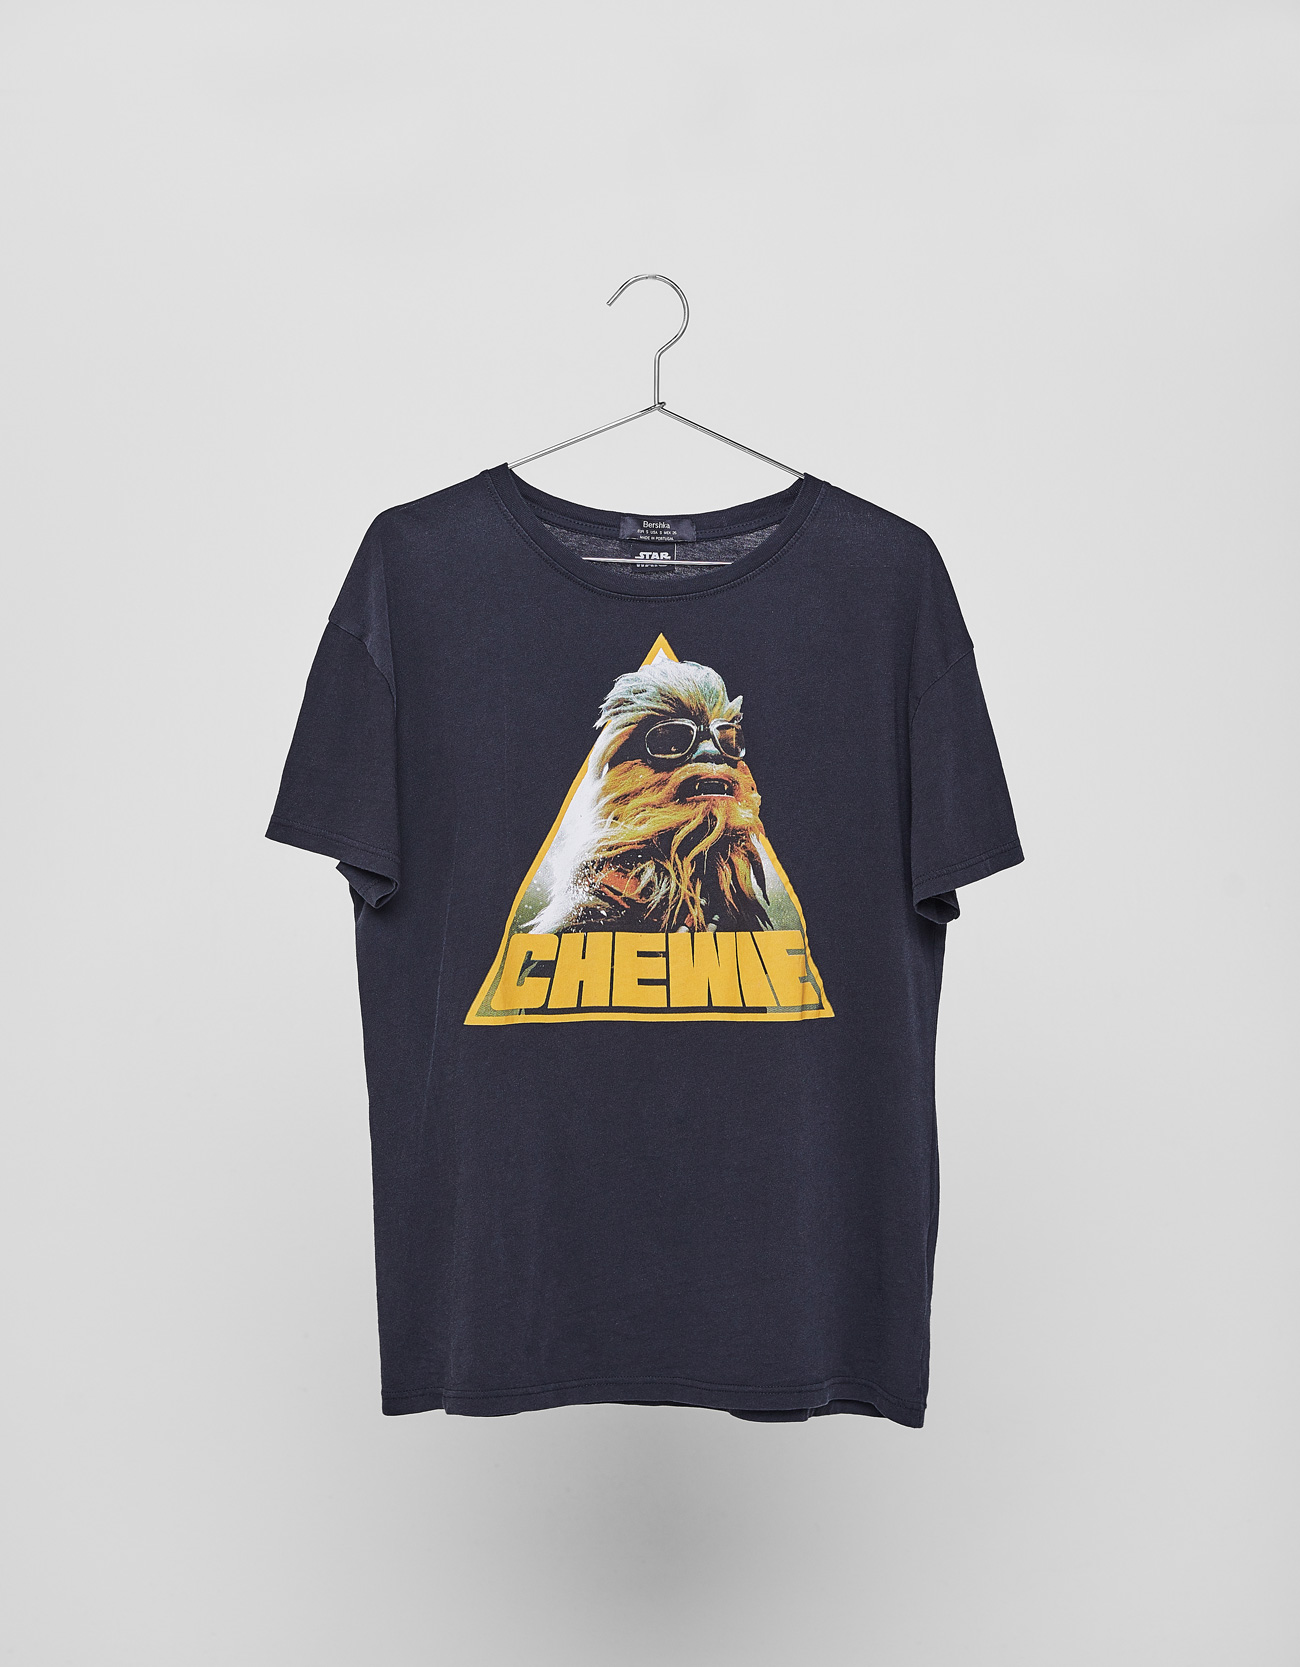 Star Wars Chewie T Shirt Clothing Bershka Bosnia And Herzegovina